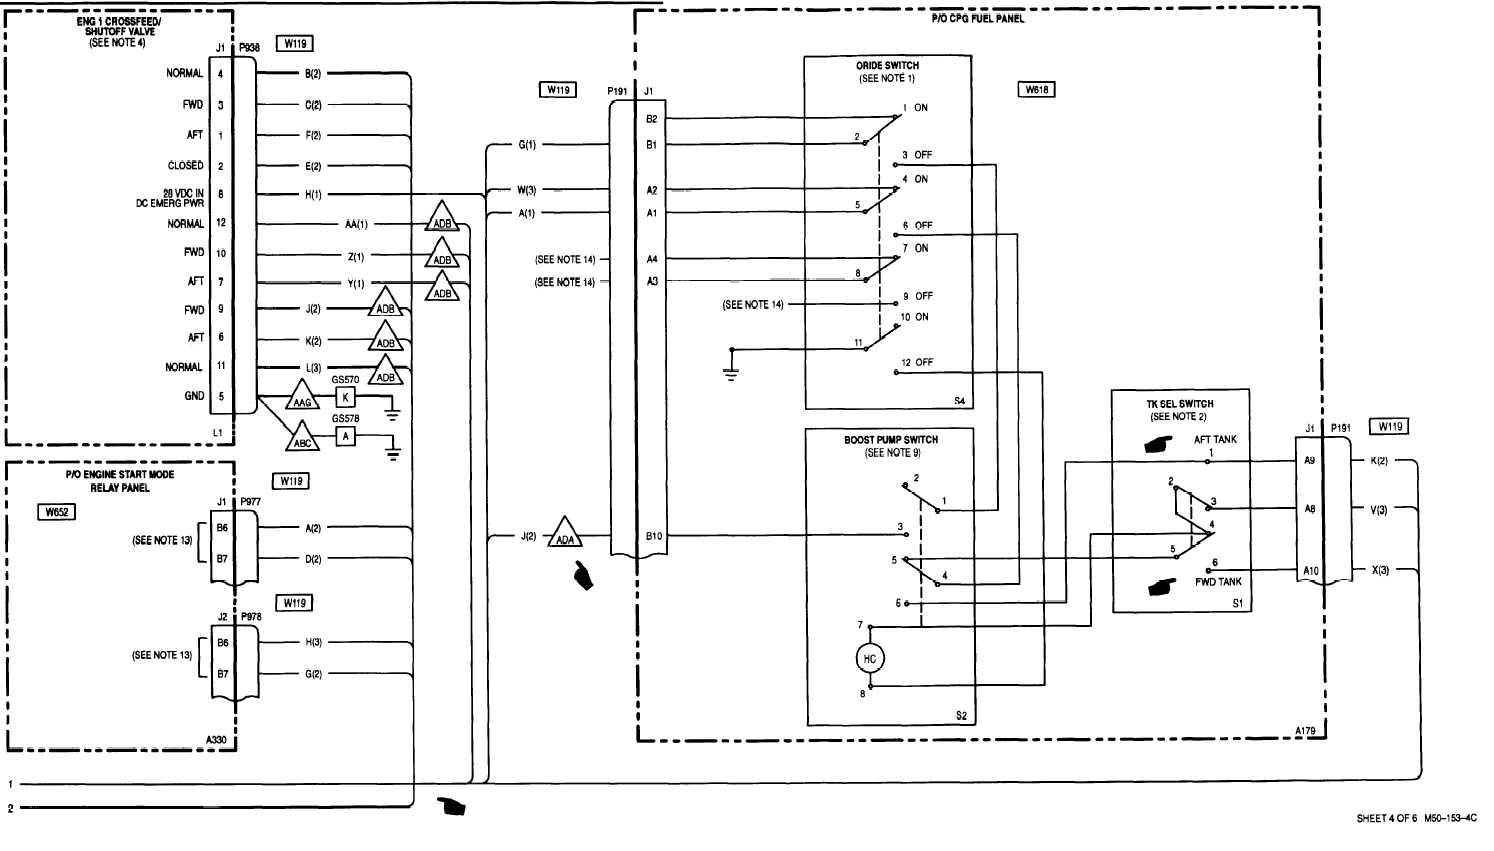 Honda Em2200x Wiring Diagram additionally 2017 Honda Grom Wiring Diagram additionally Saty Atv With Remote Wiring as well Toyota Wireing Harness Ground Warning in addition Bodine Led Wiring Diagram. on kensun wiring diagram